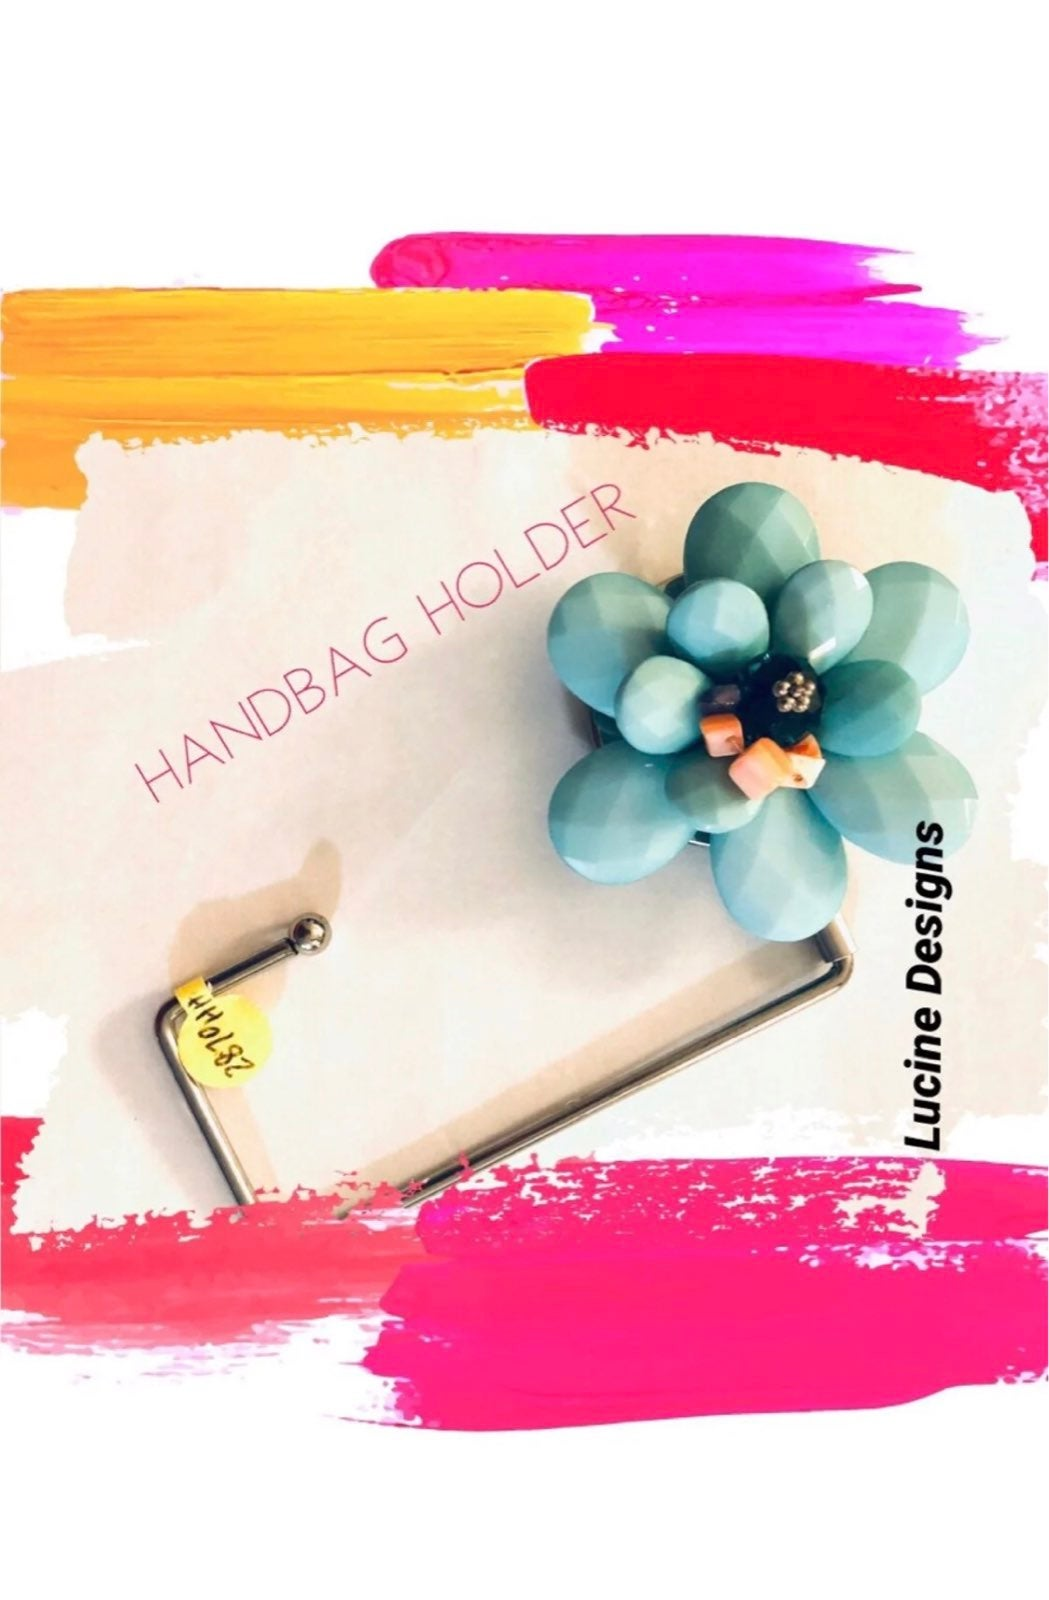 Handbag holder by Lucine Designs NEW